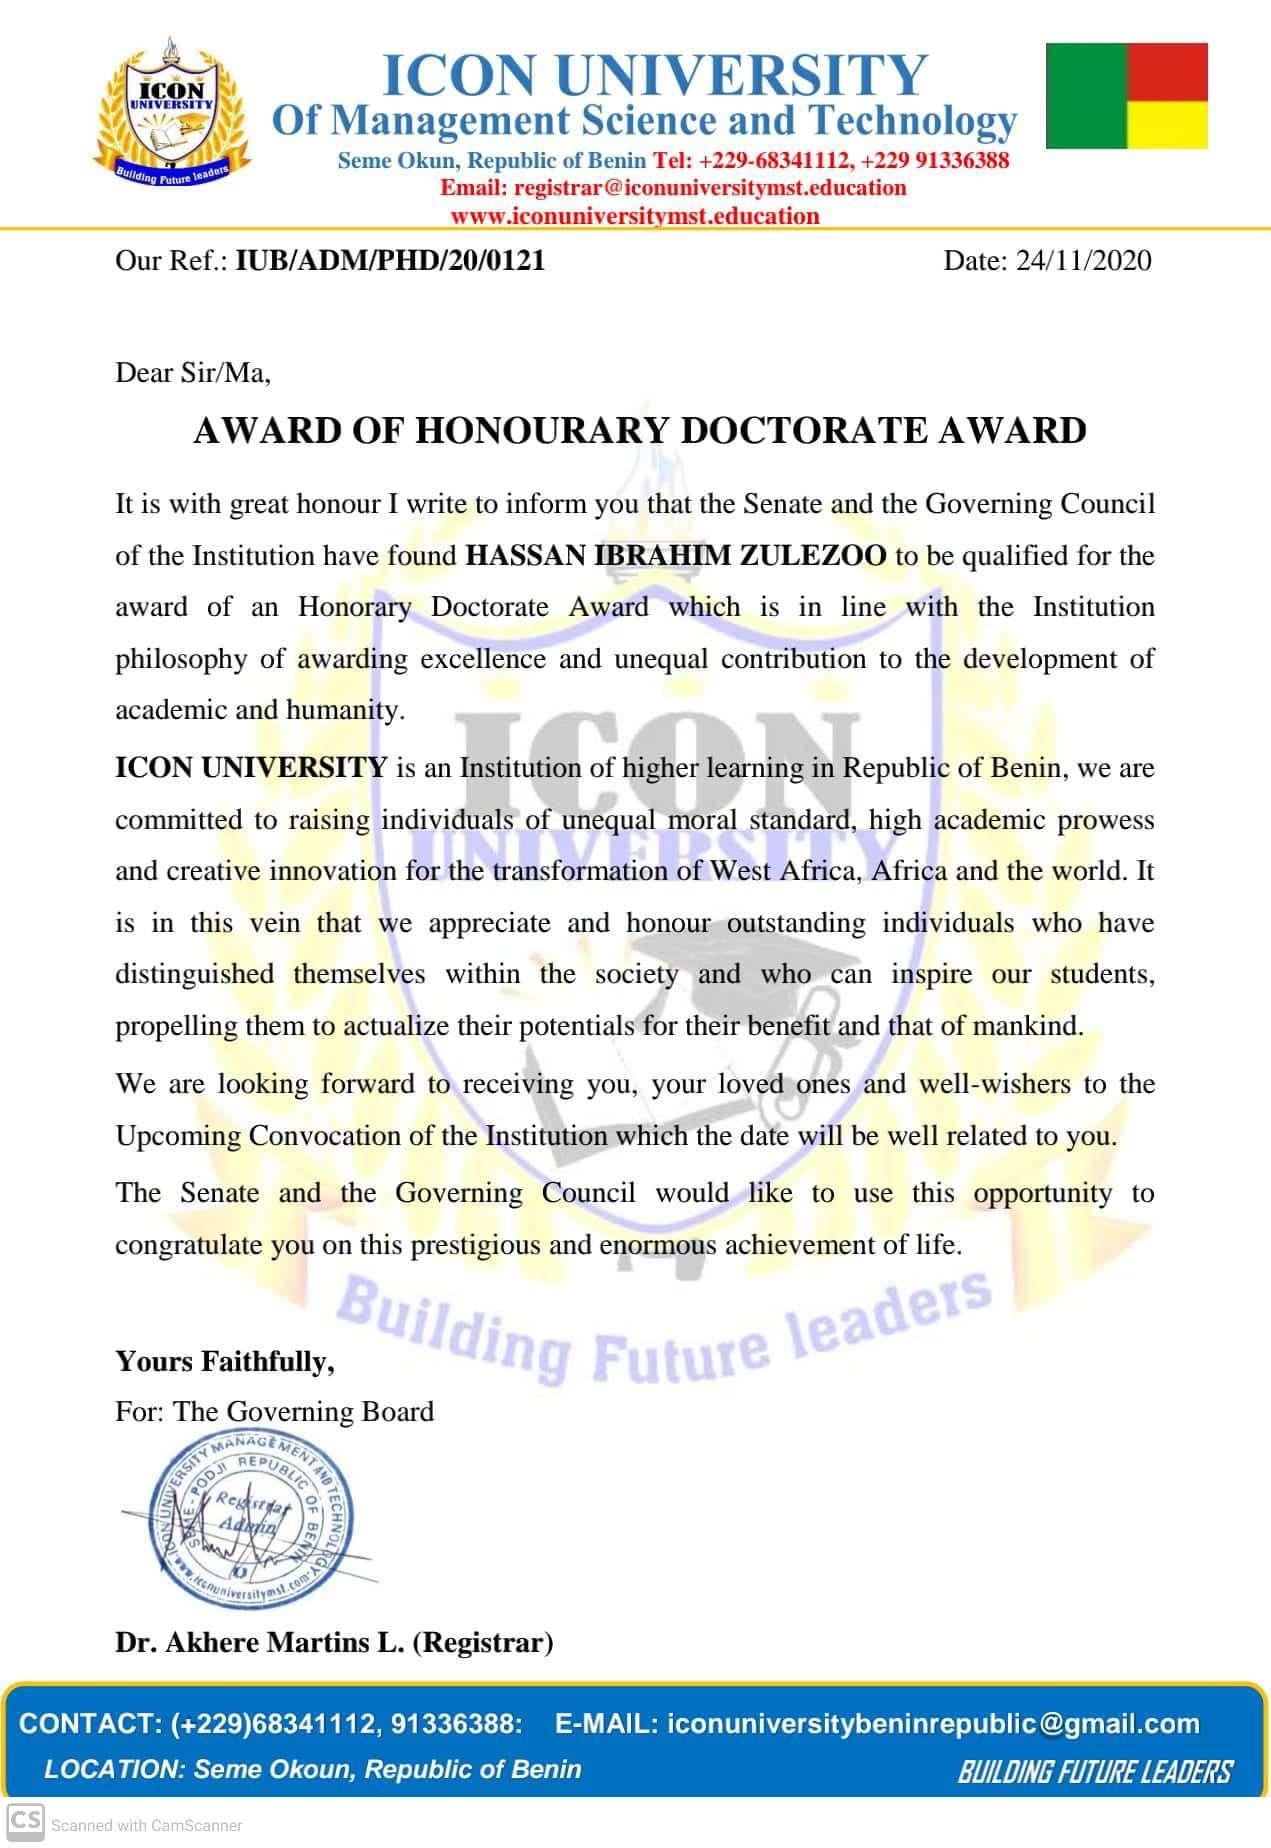 Zulezoo receives award of Honourary doctorate award